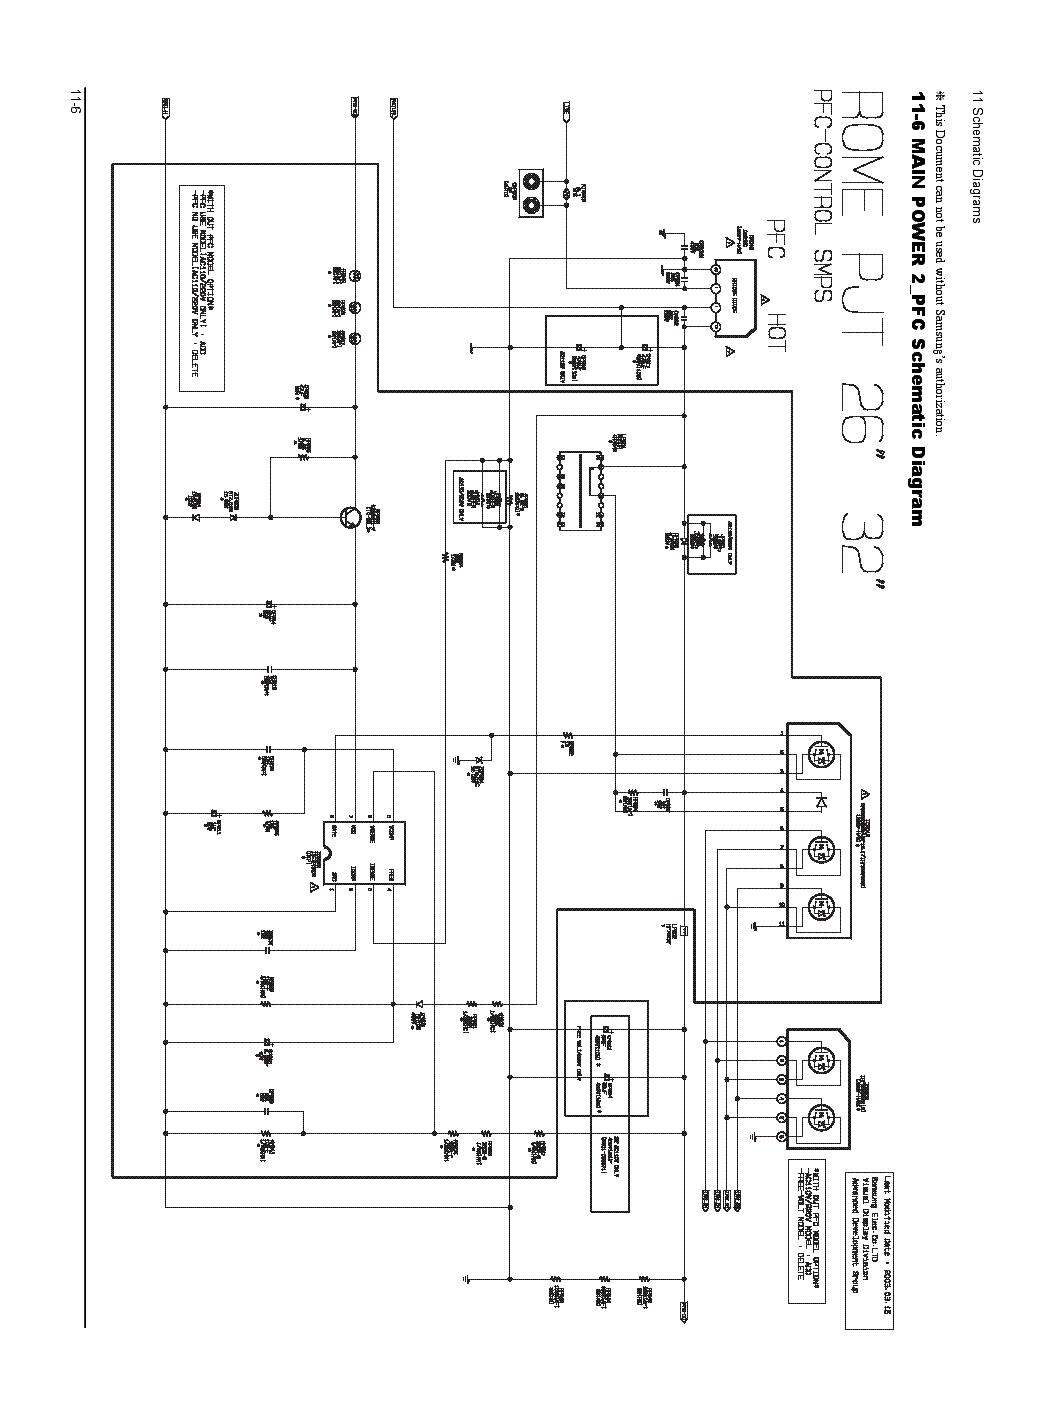 SAMSUNG BN96-01805A RE23UO SMPS SCH Service Manual